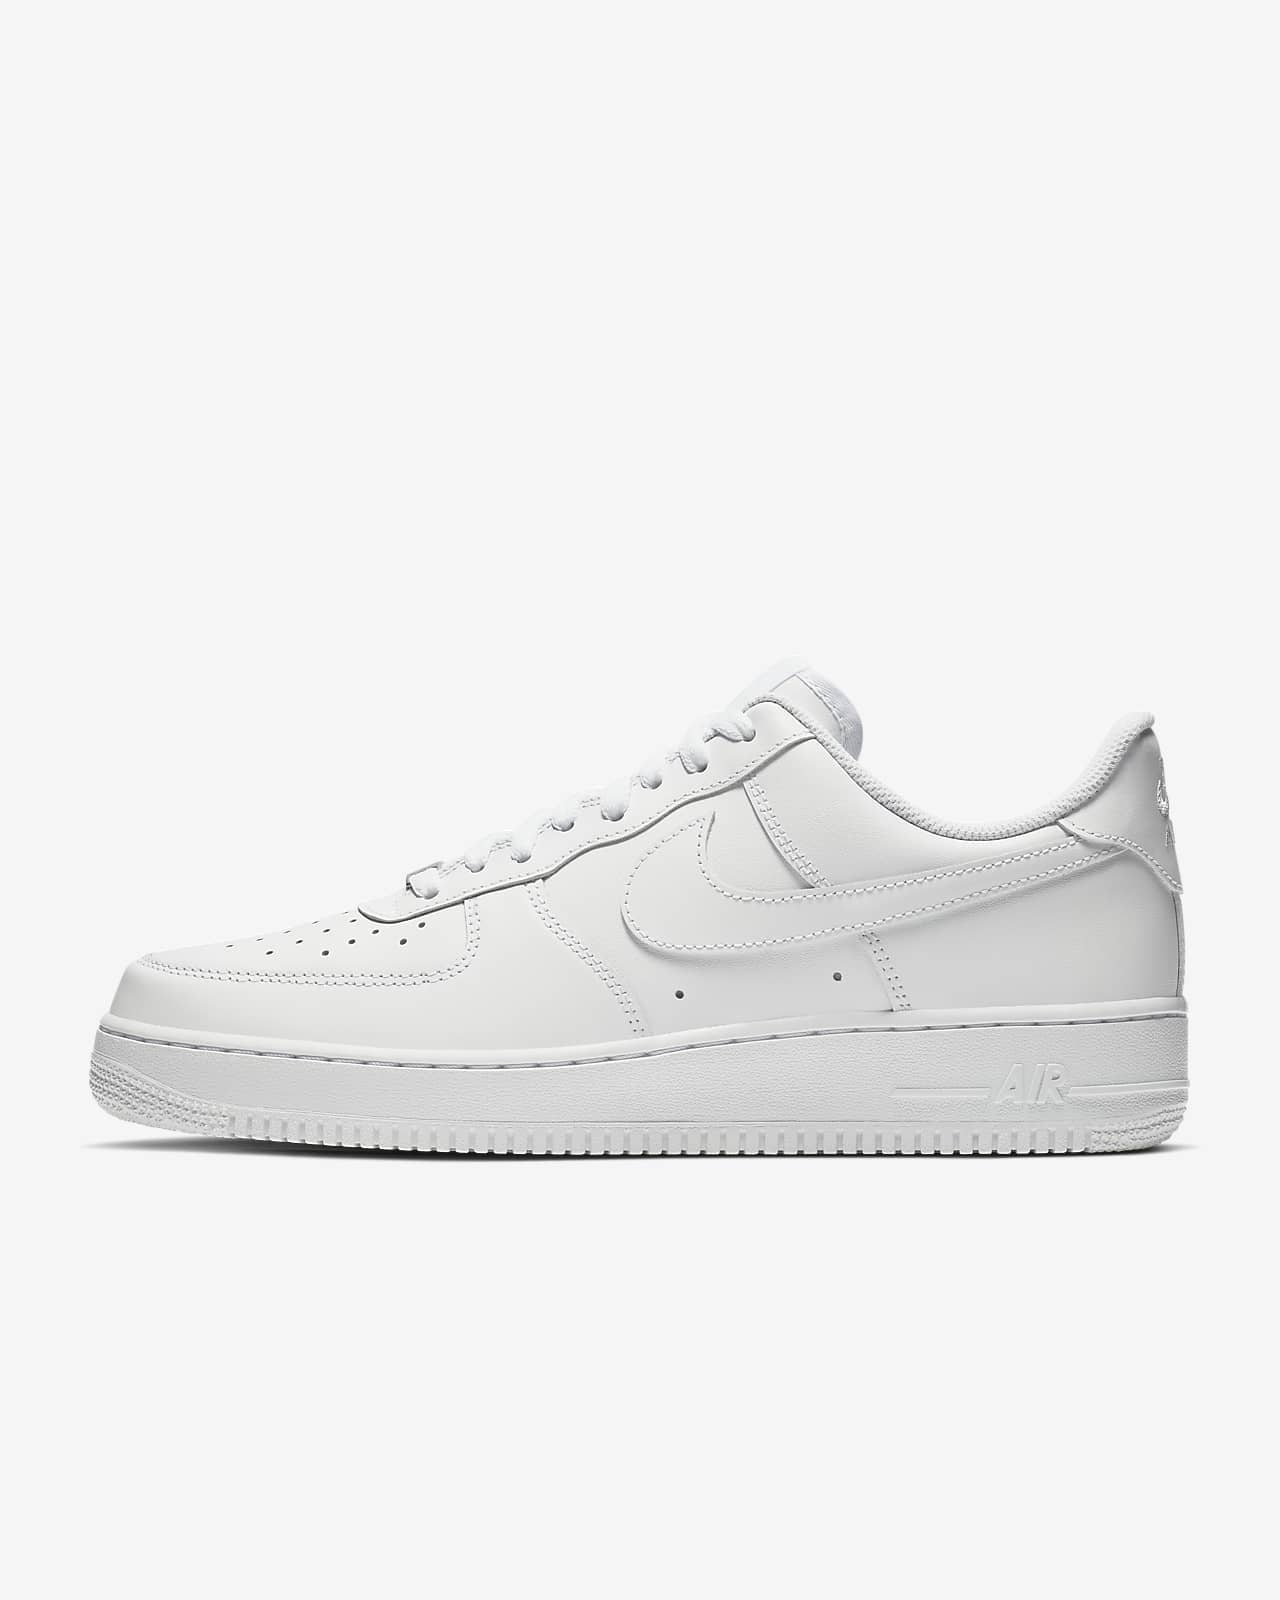 Litoral Perjudicial lunes  Nike Air Force 1 '07 Erkek Ayakkabısı. Nike TR